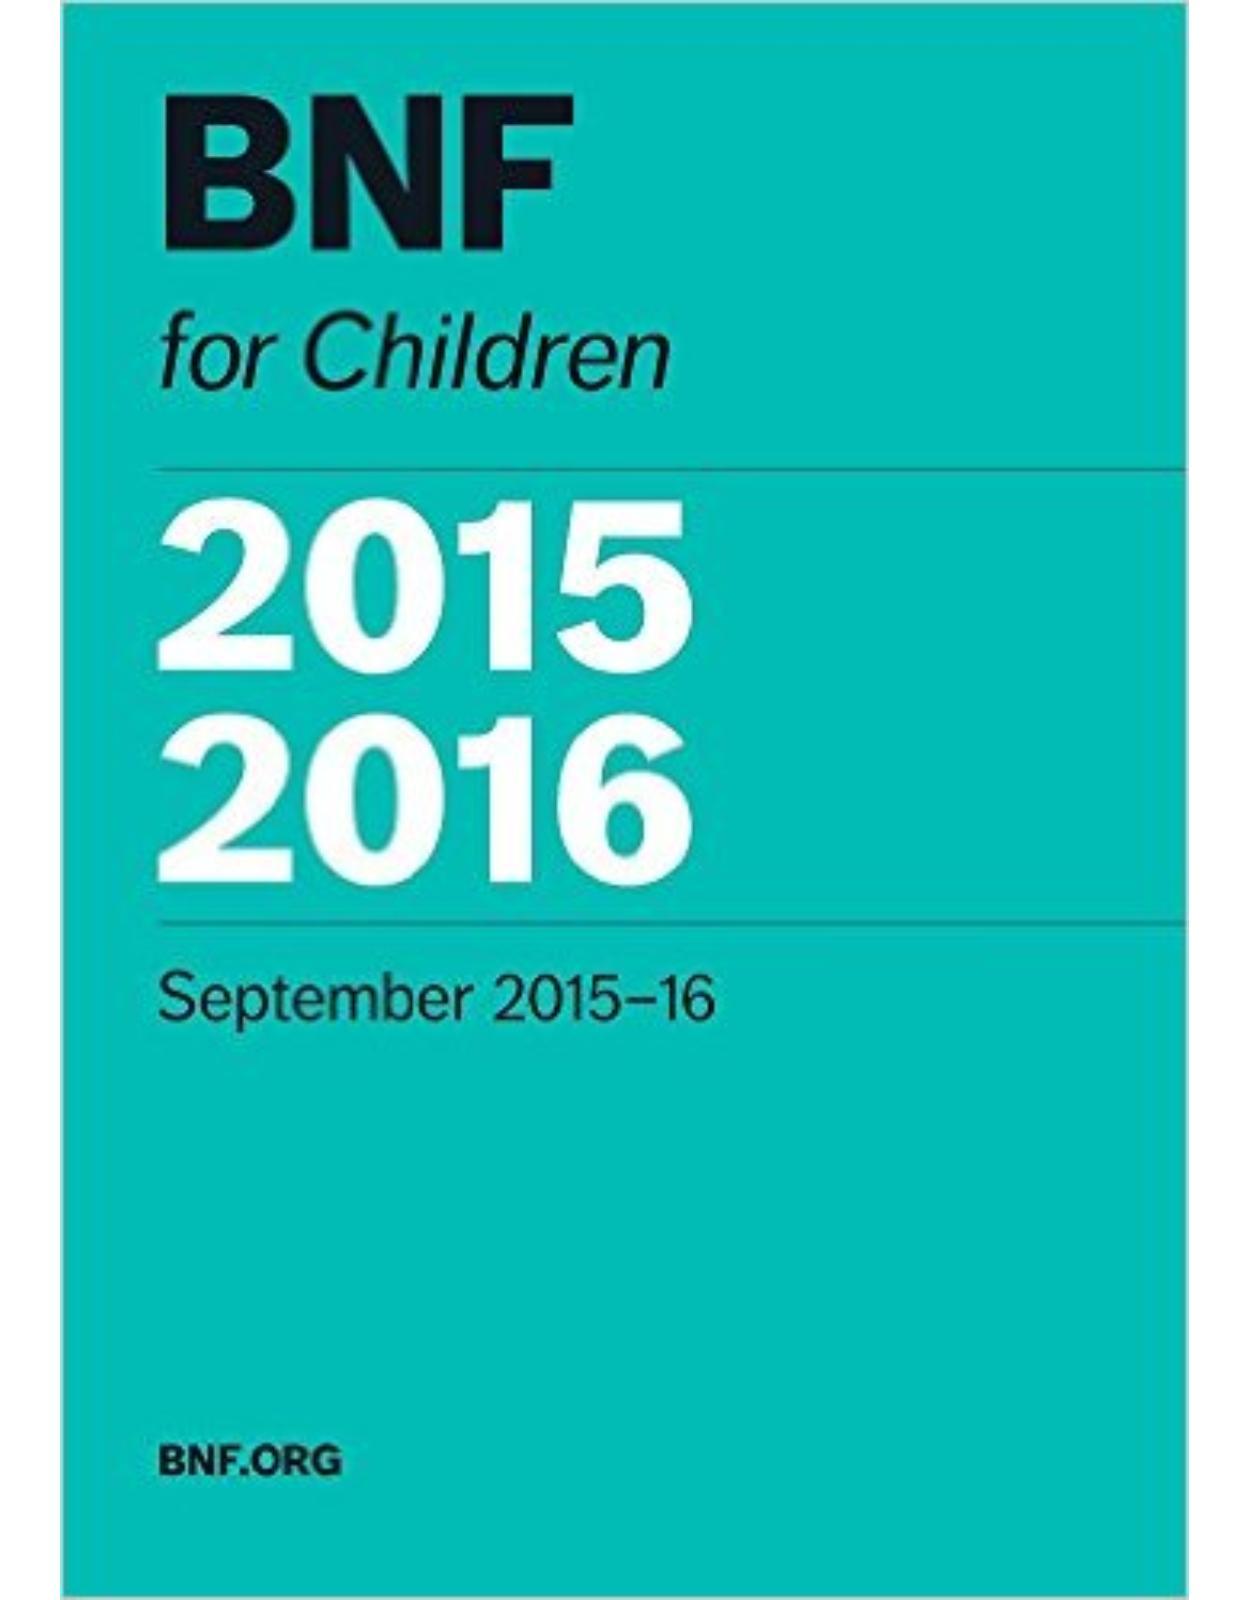 British National Formulary for Children 2015-2016 1st Edition